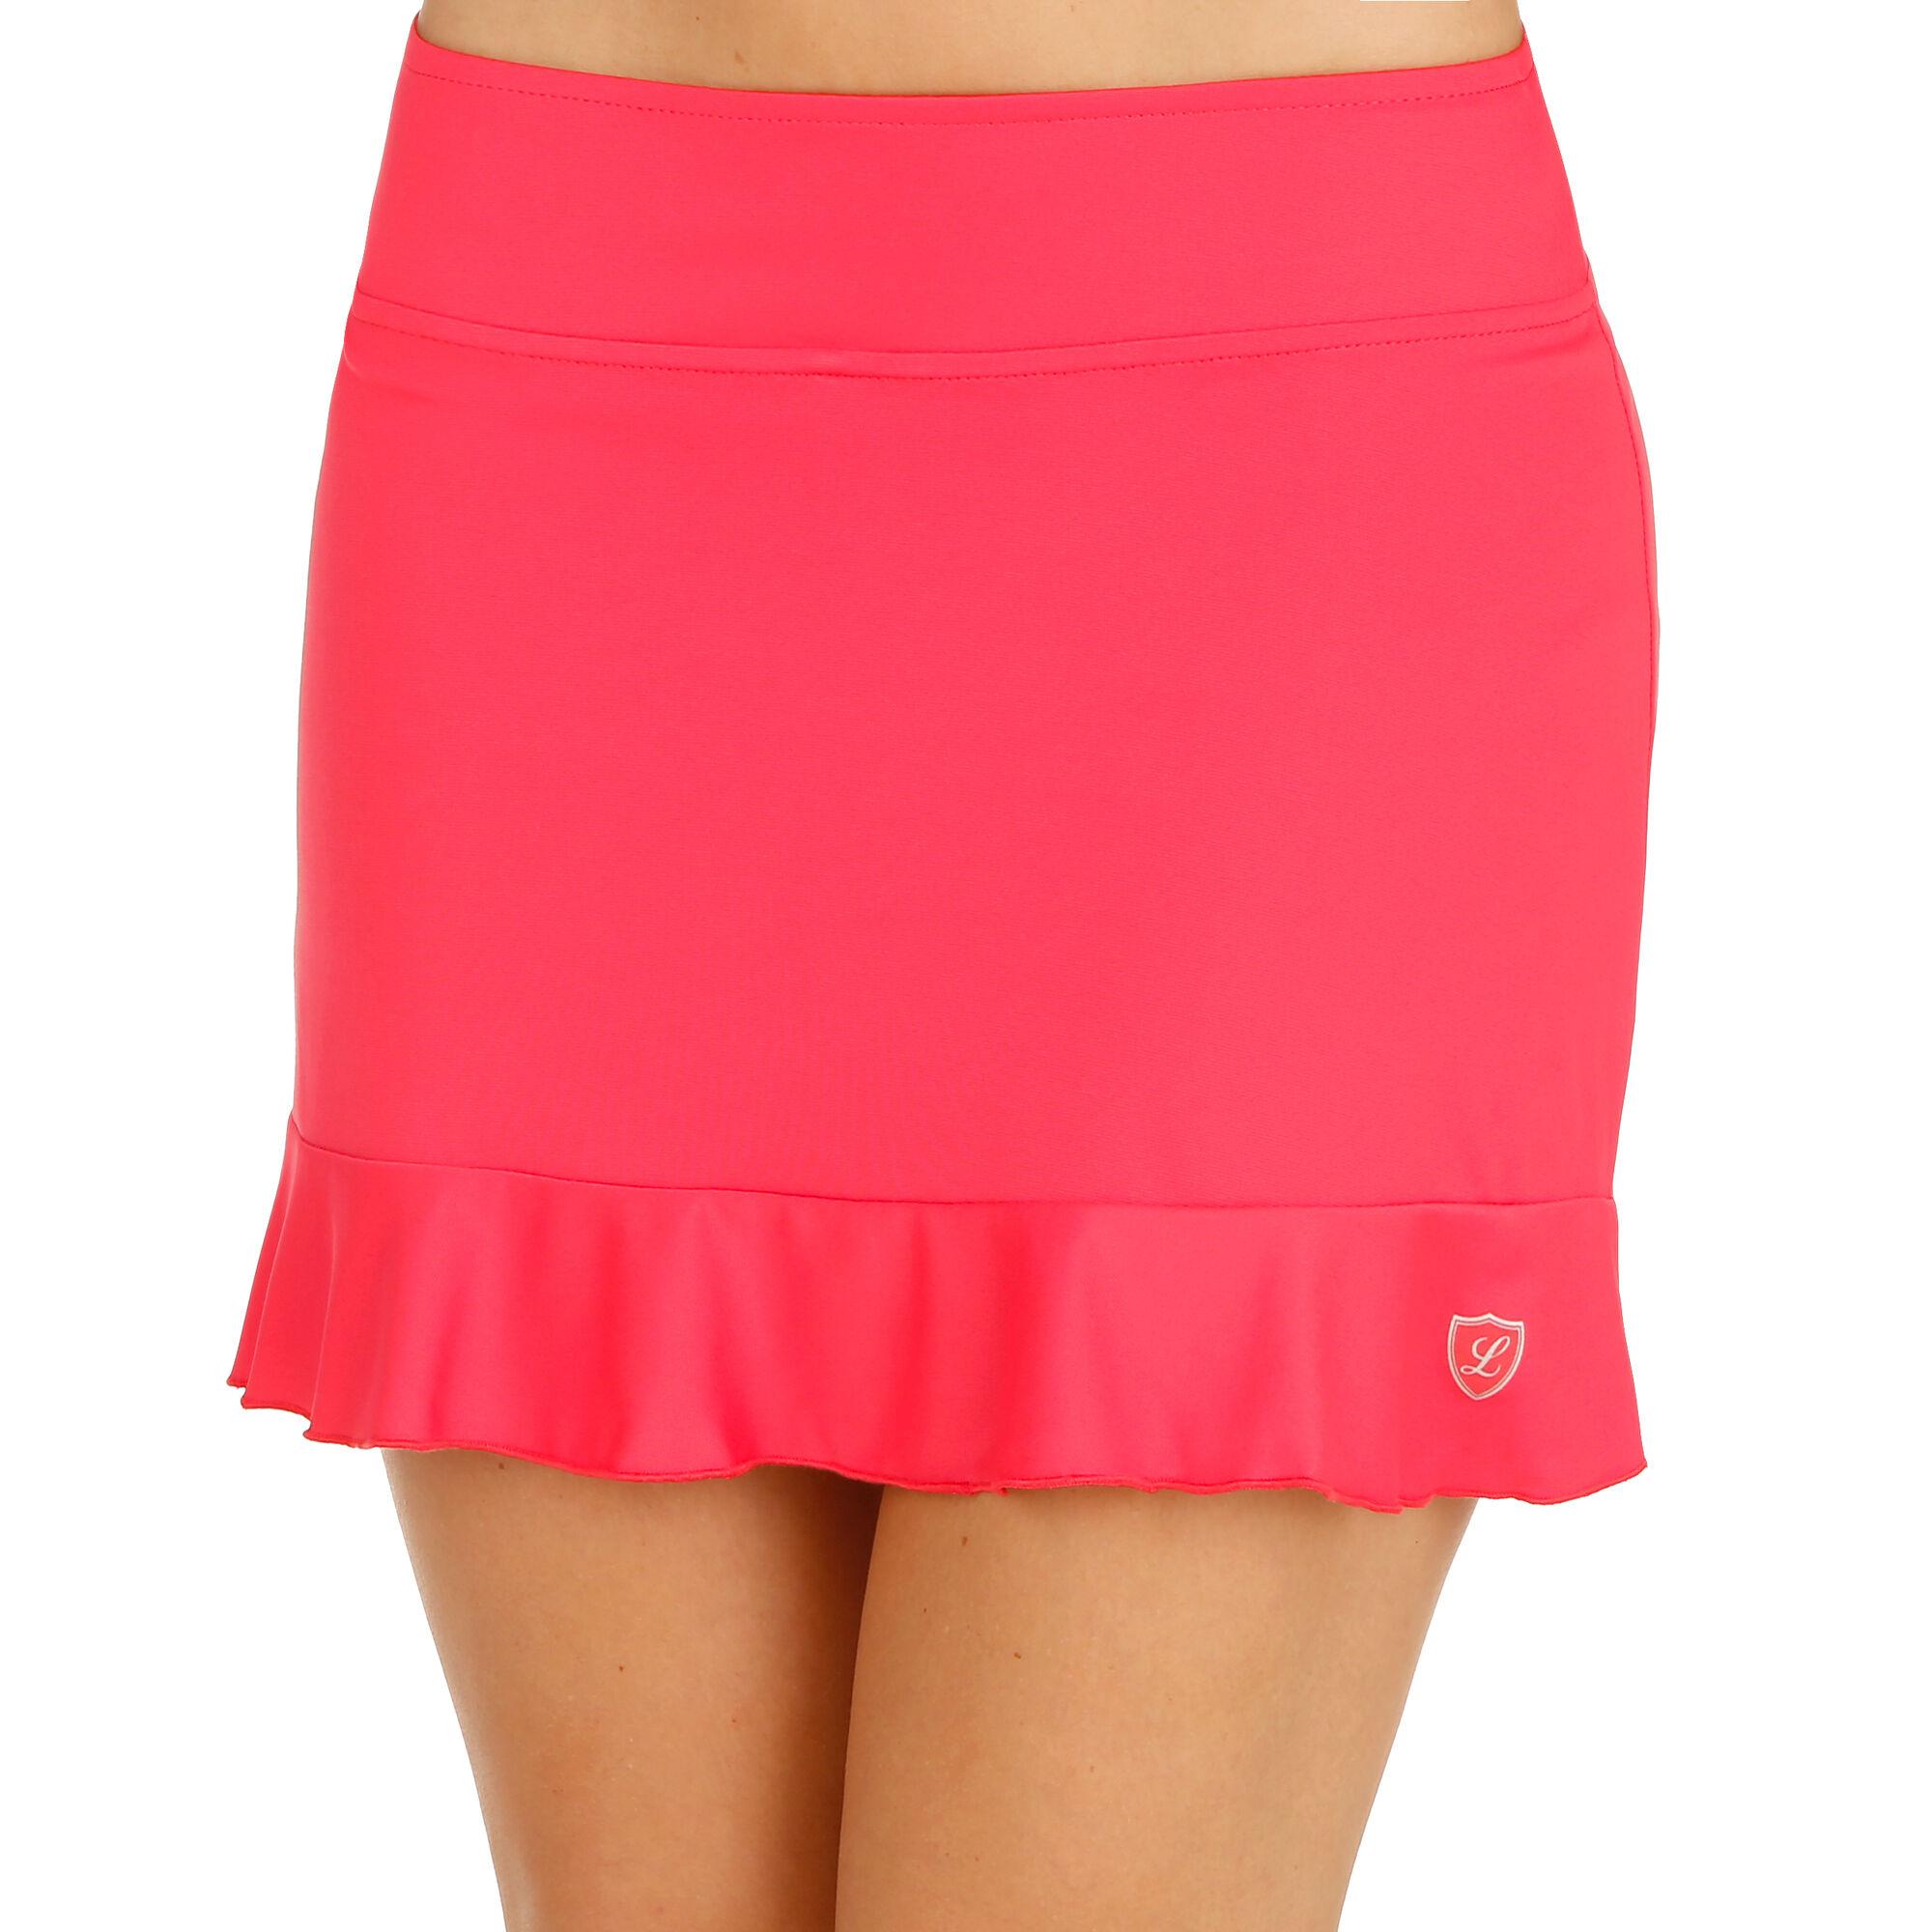 best service 2c1b9 bfa1e Limited Sports Sihu Rock Damen - Pink, Silber online kaufen ...